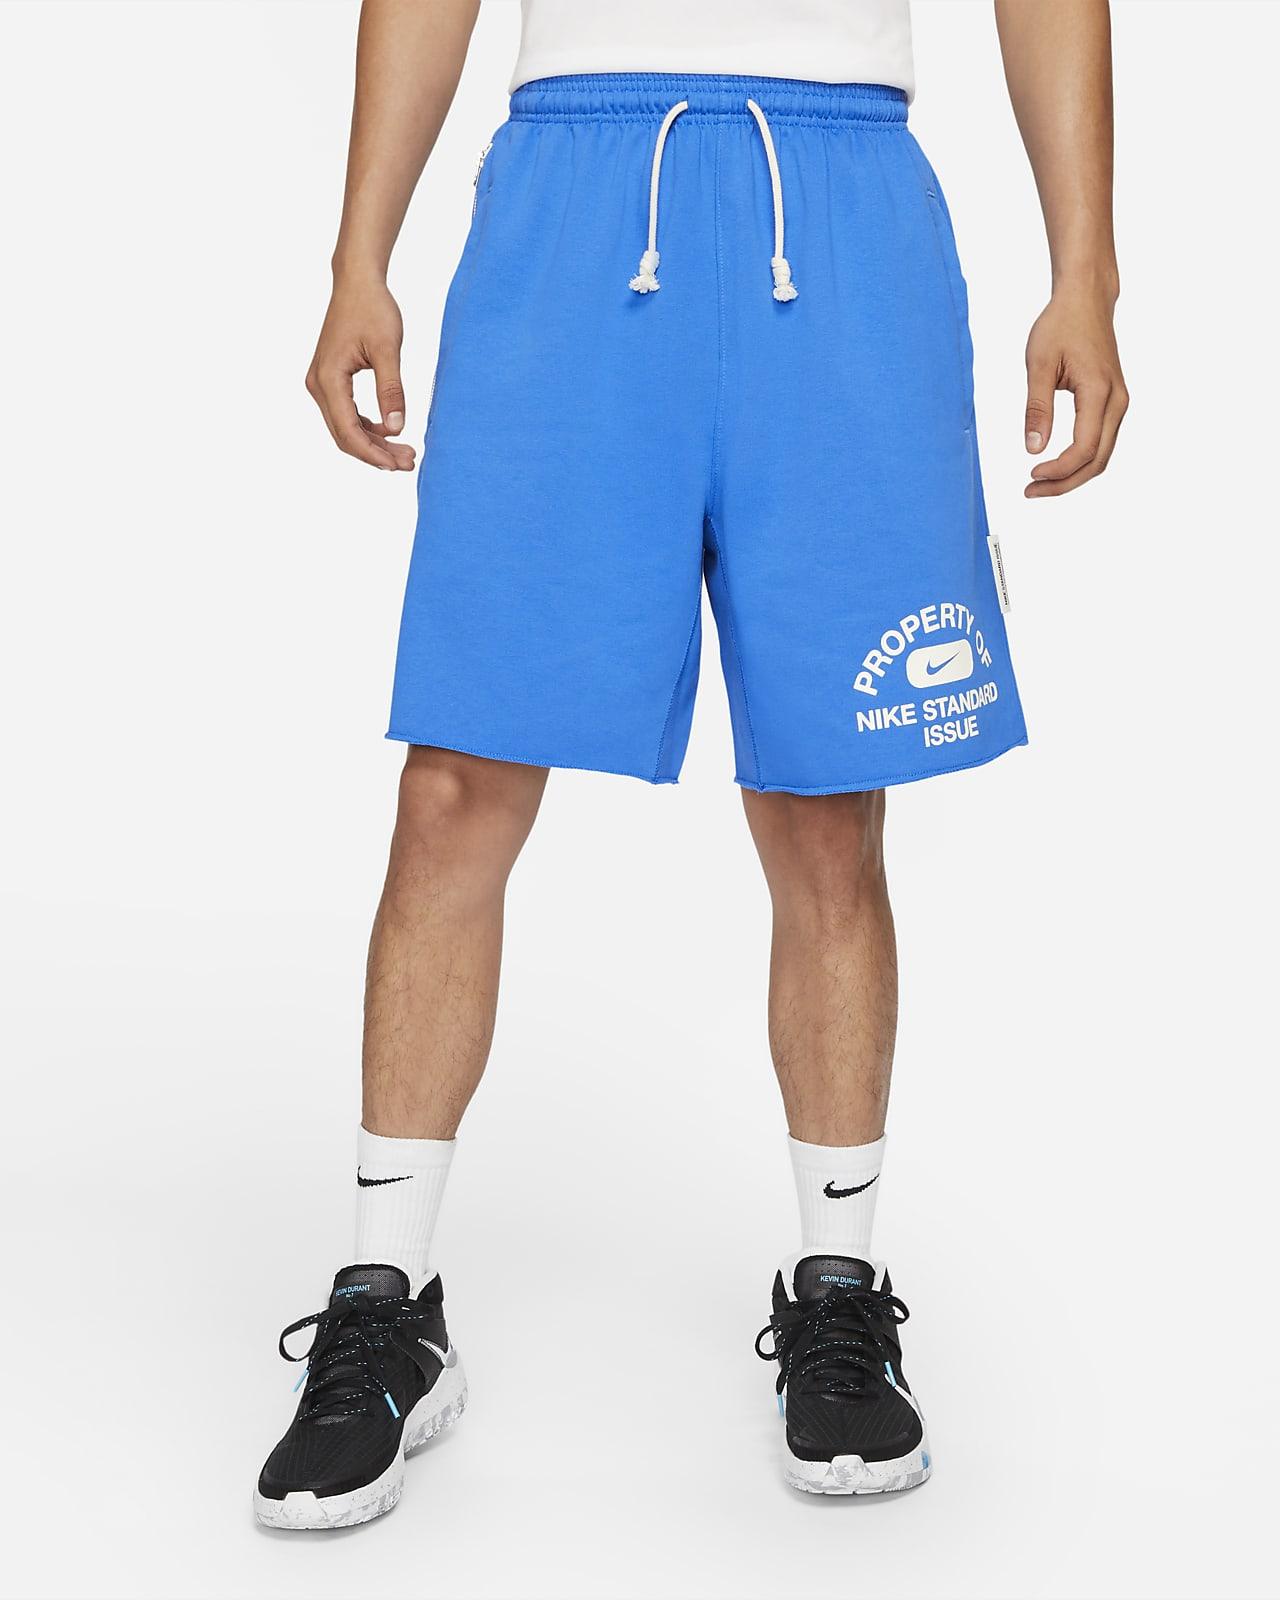 Nike Standard Issue Men's Basketball Shorts